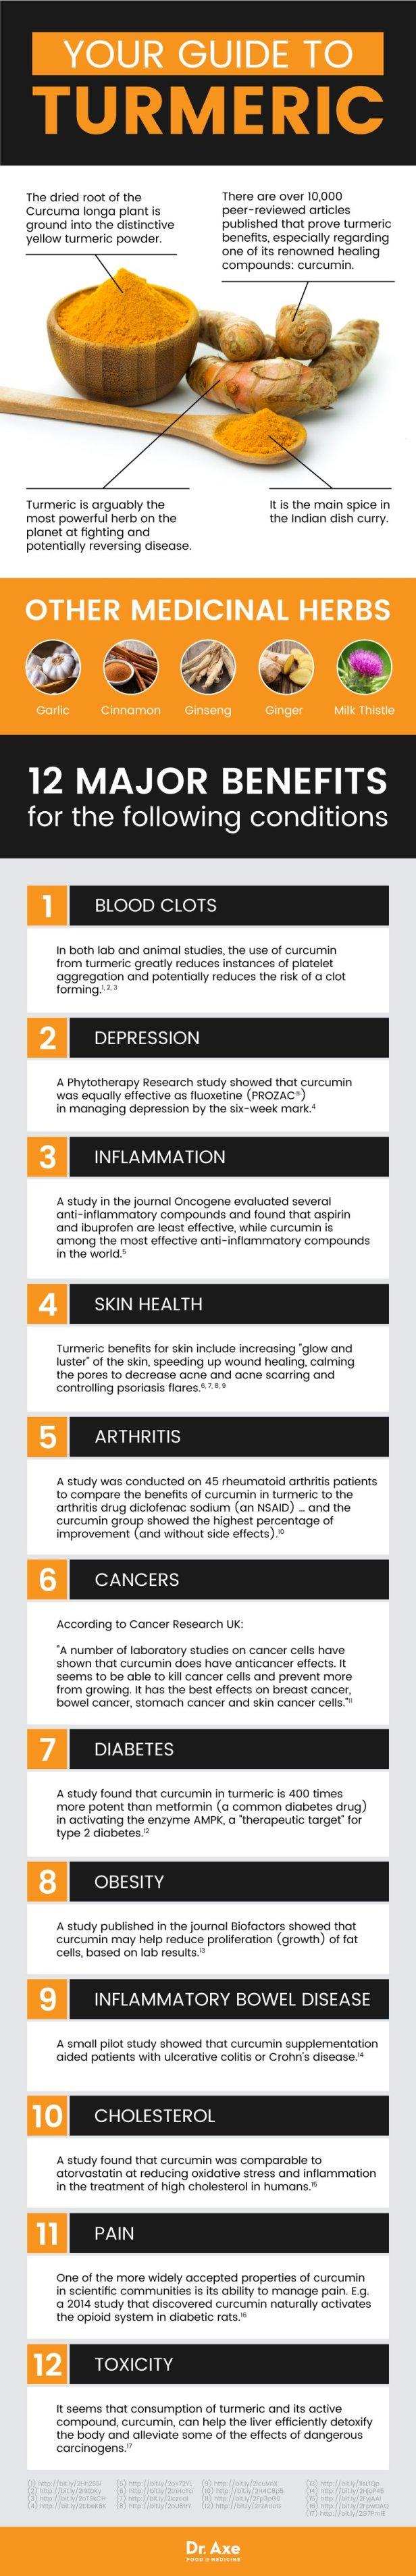 turmeric-benefits_graphic-1